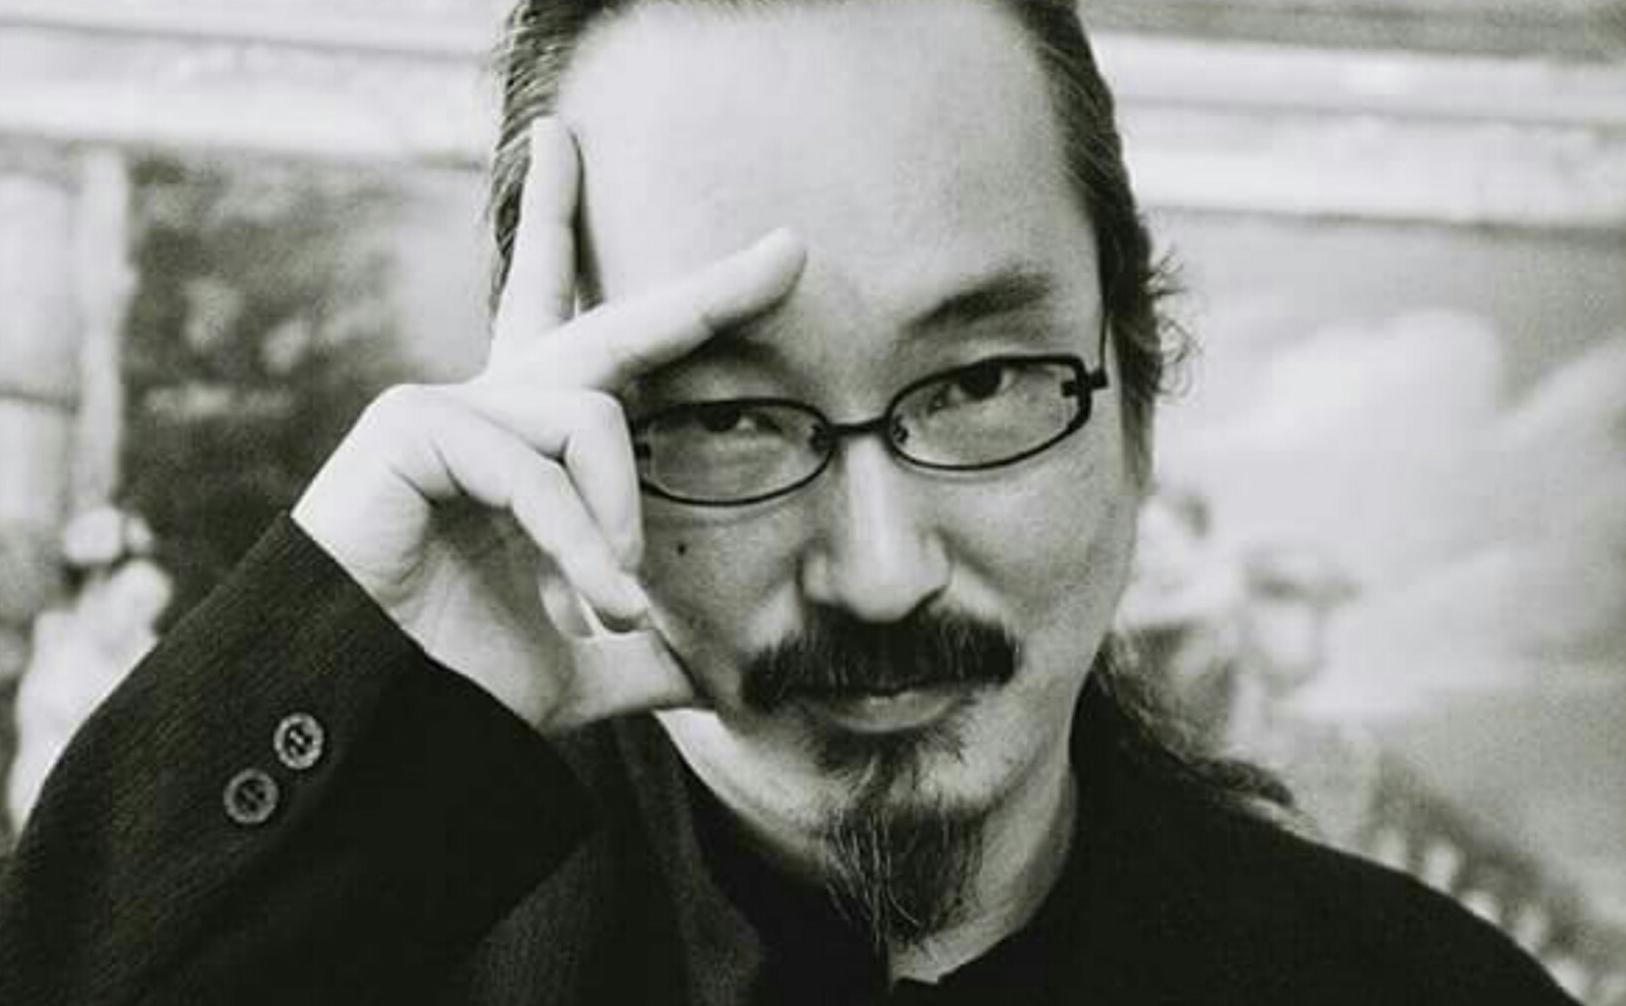 Satoshi Kon: October 12th, 1963 - August 24th, 2010